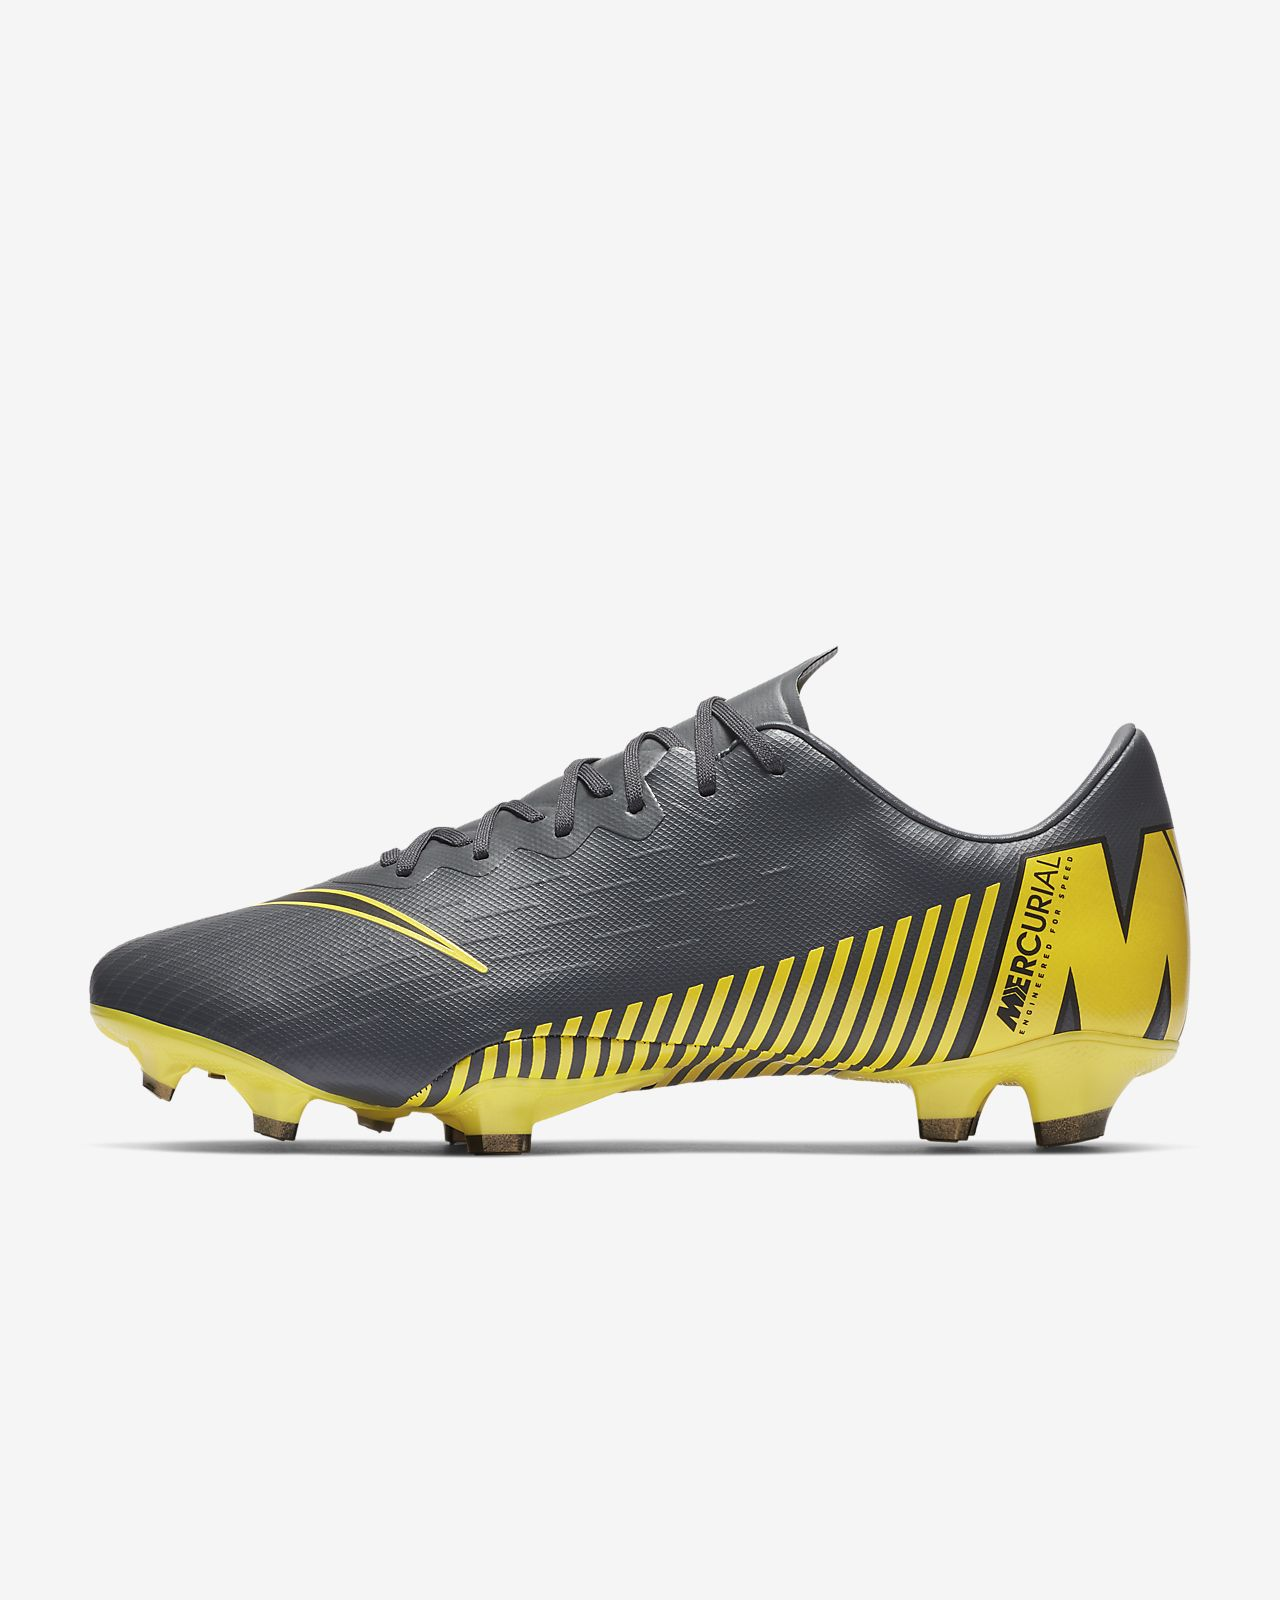 lowest price f8cdf 1edf2 ... Calzado de fútbol para terreno firme Nike Vapor 12 Pro FG Game Over